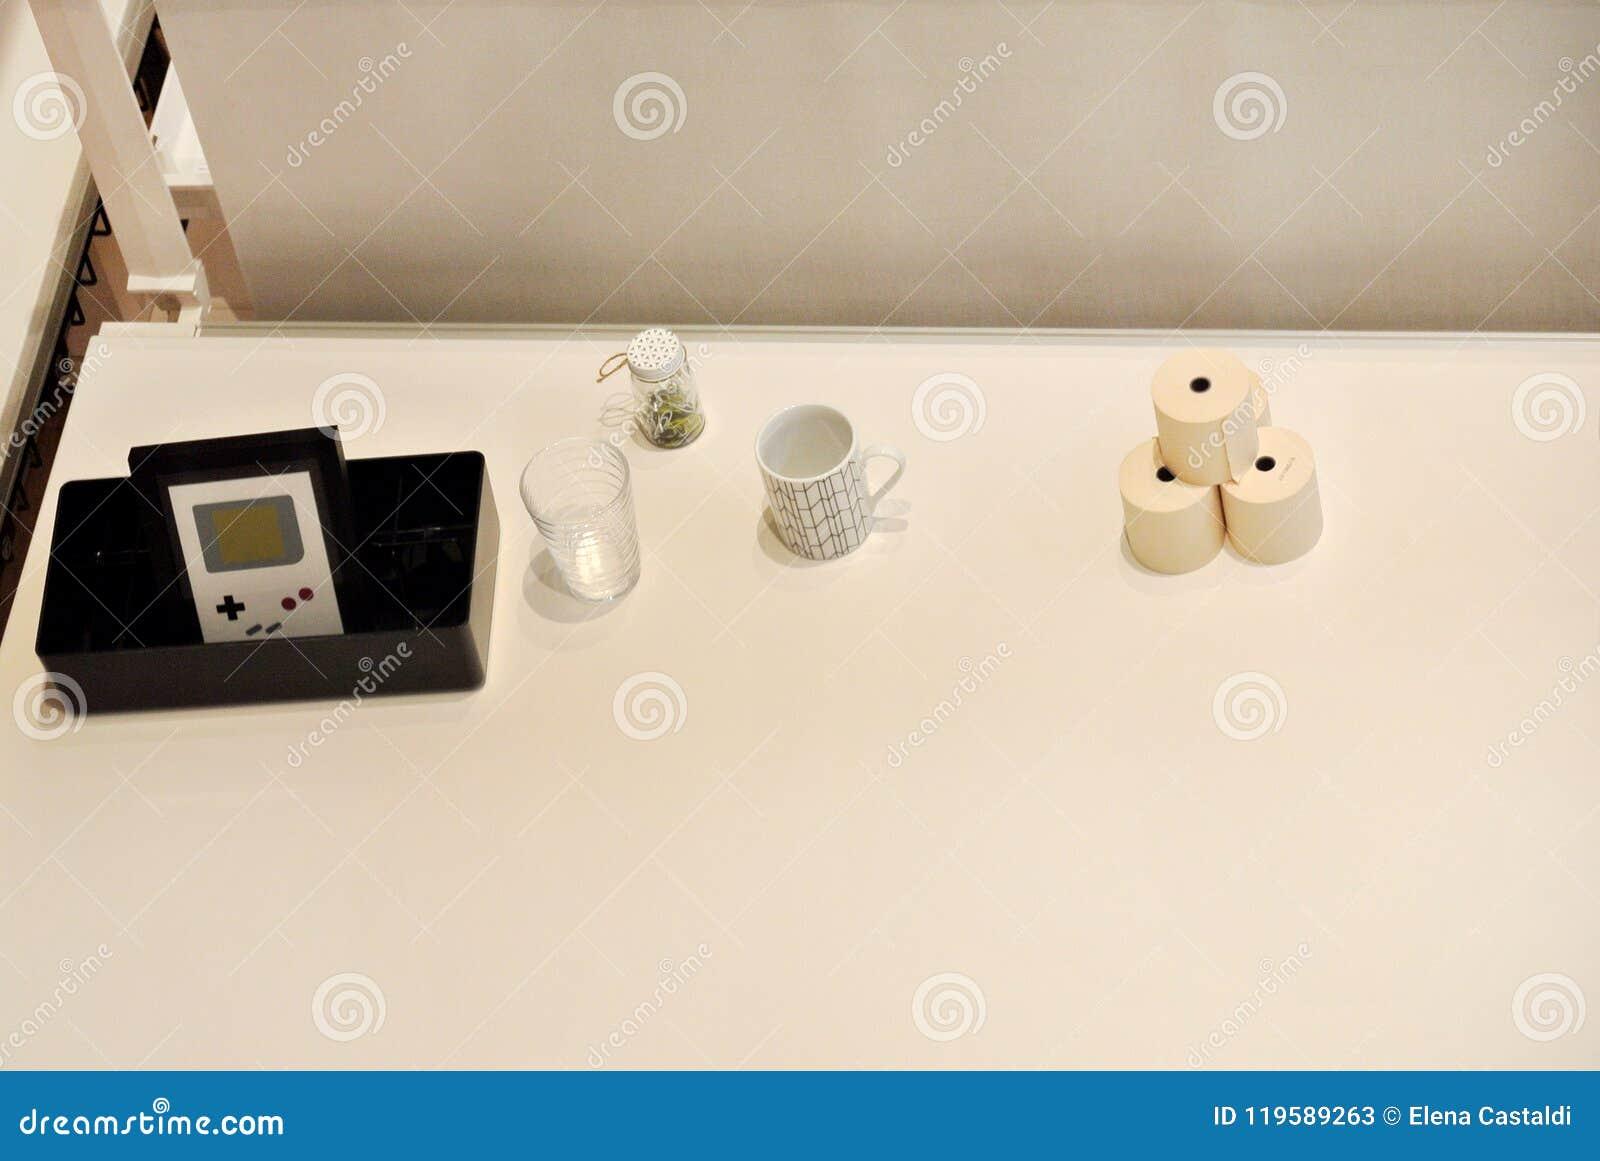 The wooden work desk